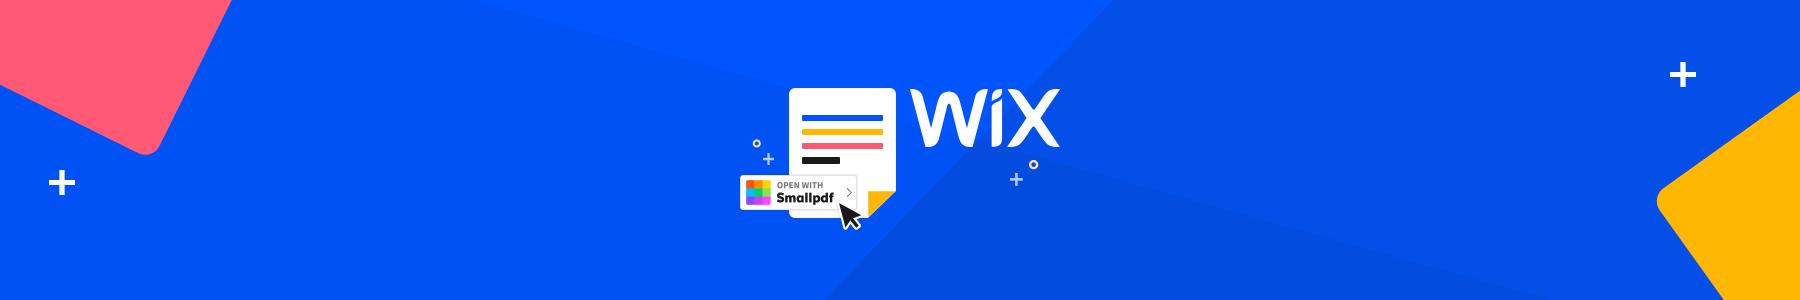 integrer-pdf-wix@2x